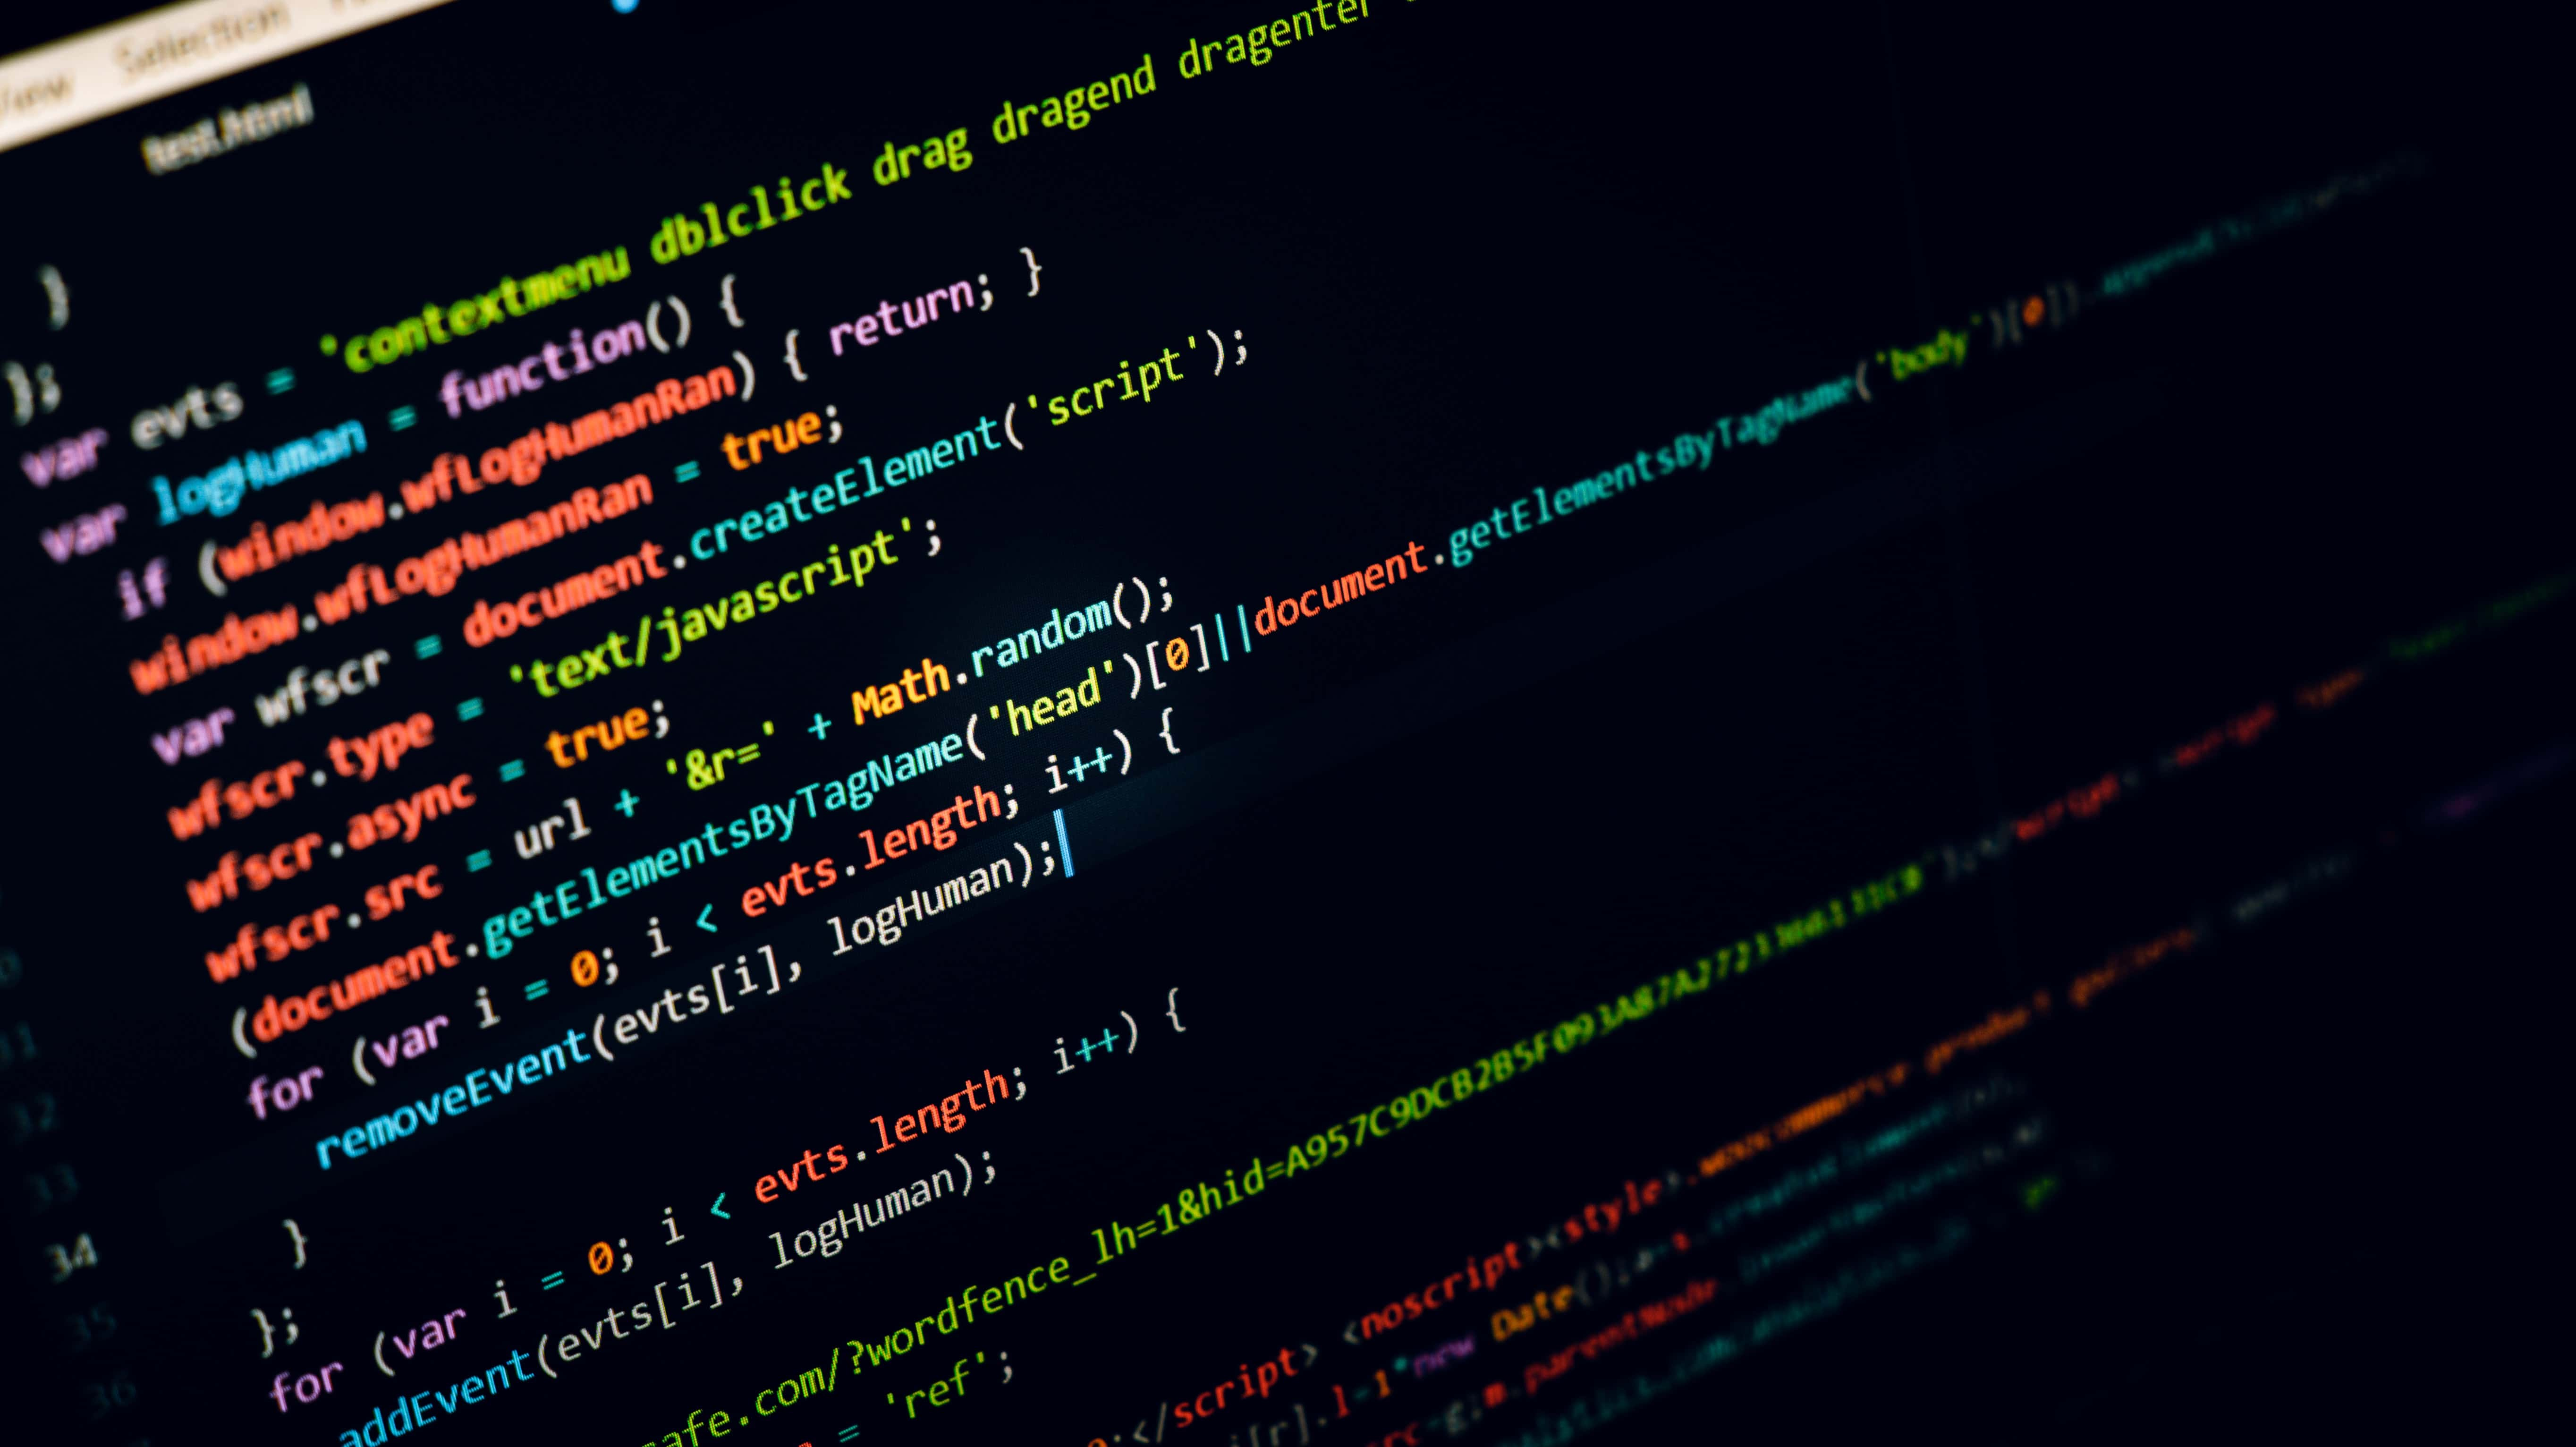 Vigo County School Calendar.Vigo Officials Hire Outside Firm To Help Battle Ransomware Attack